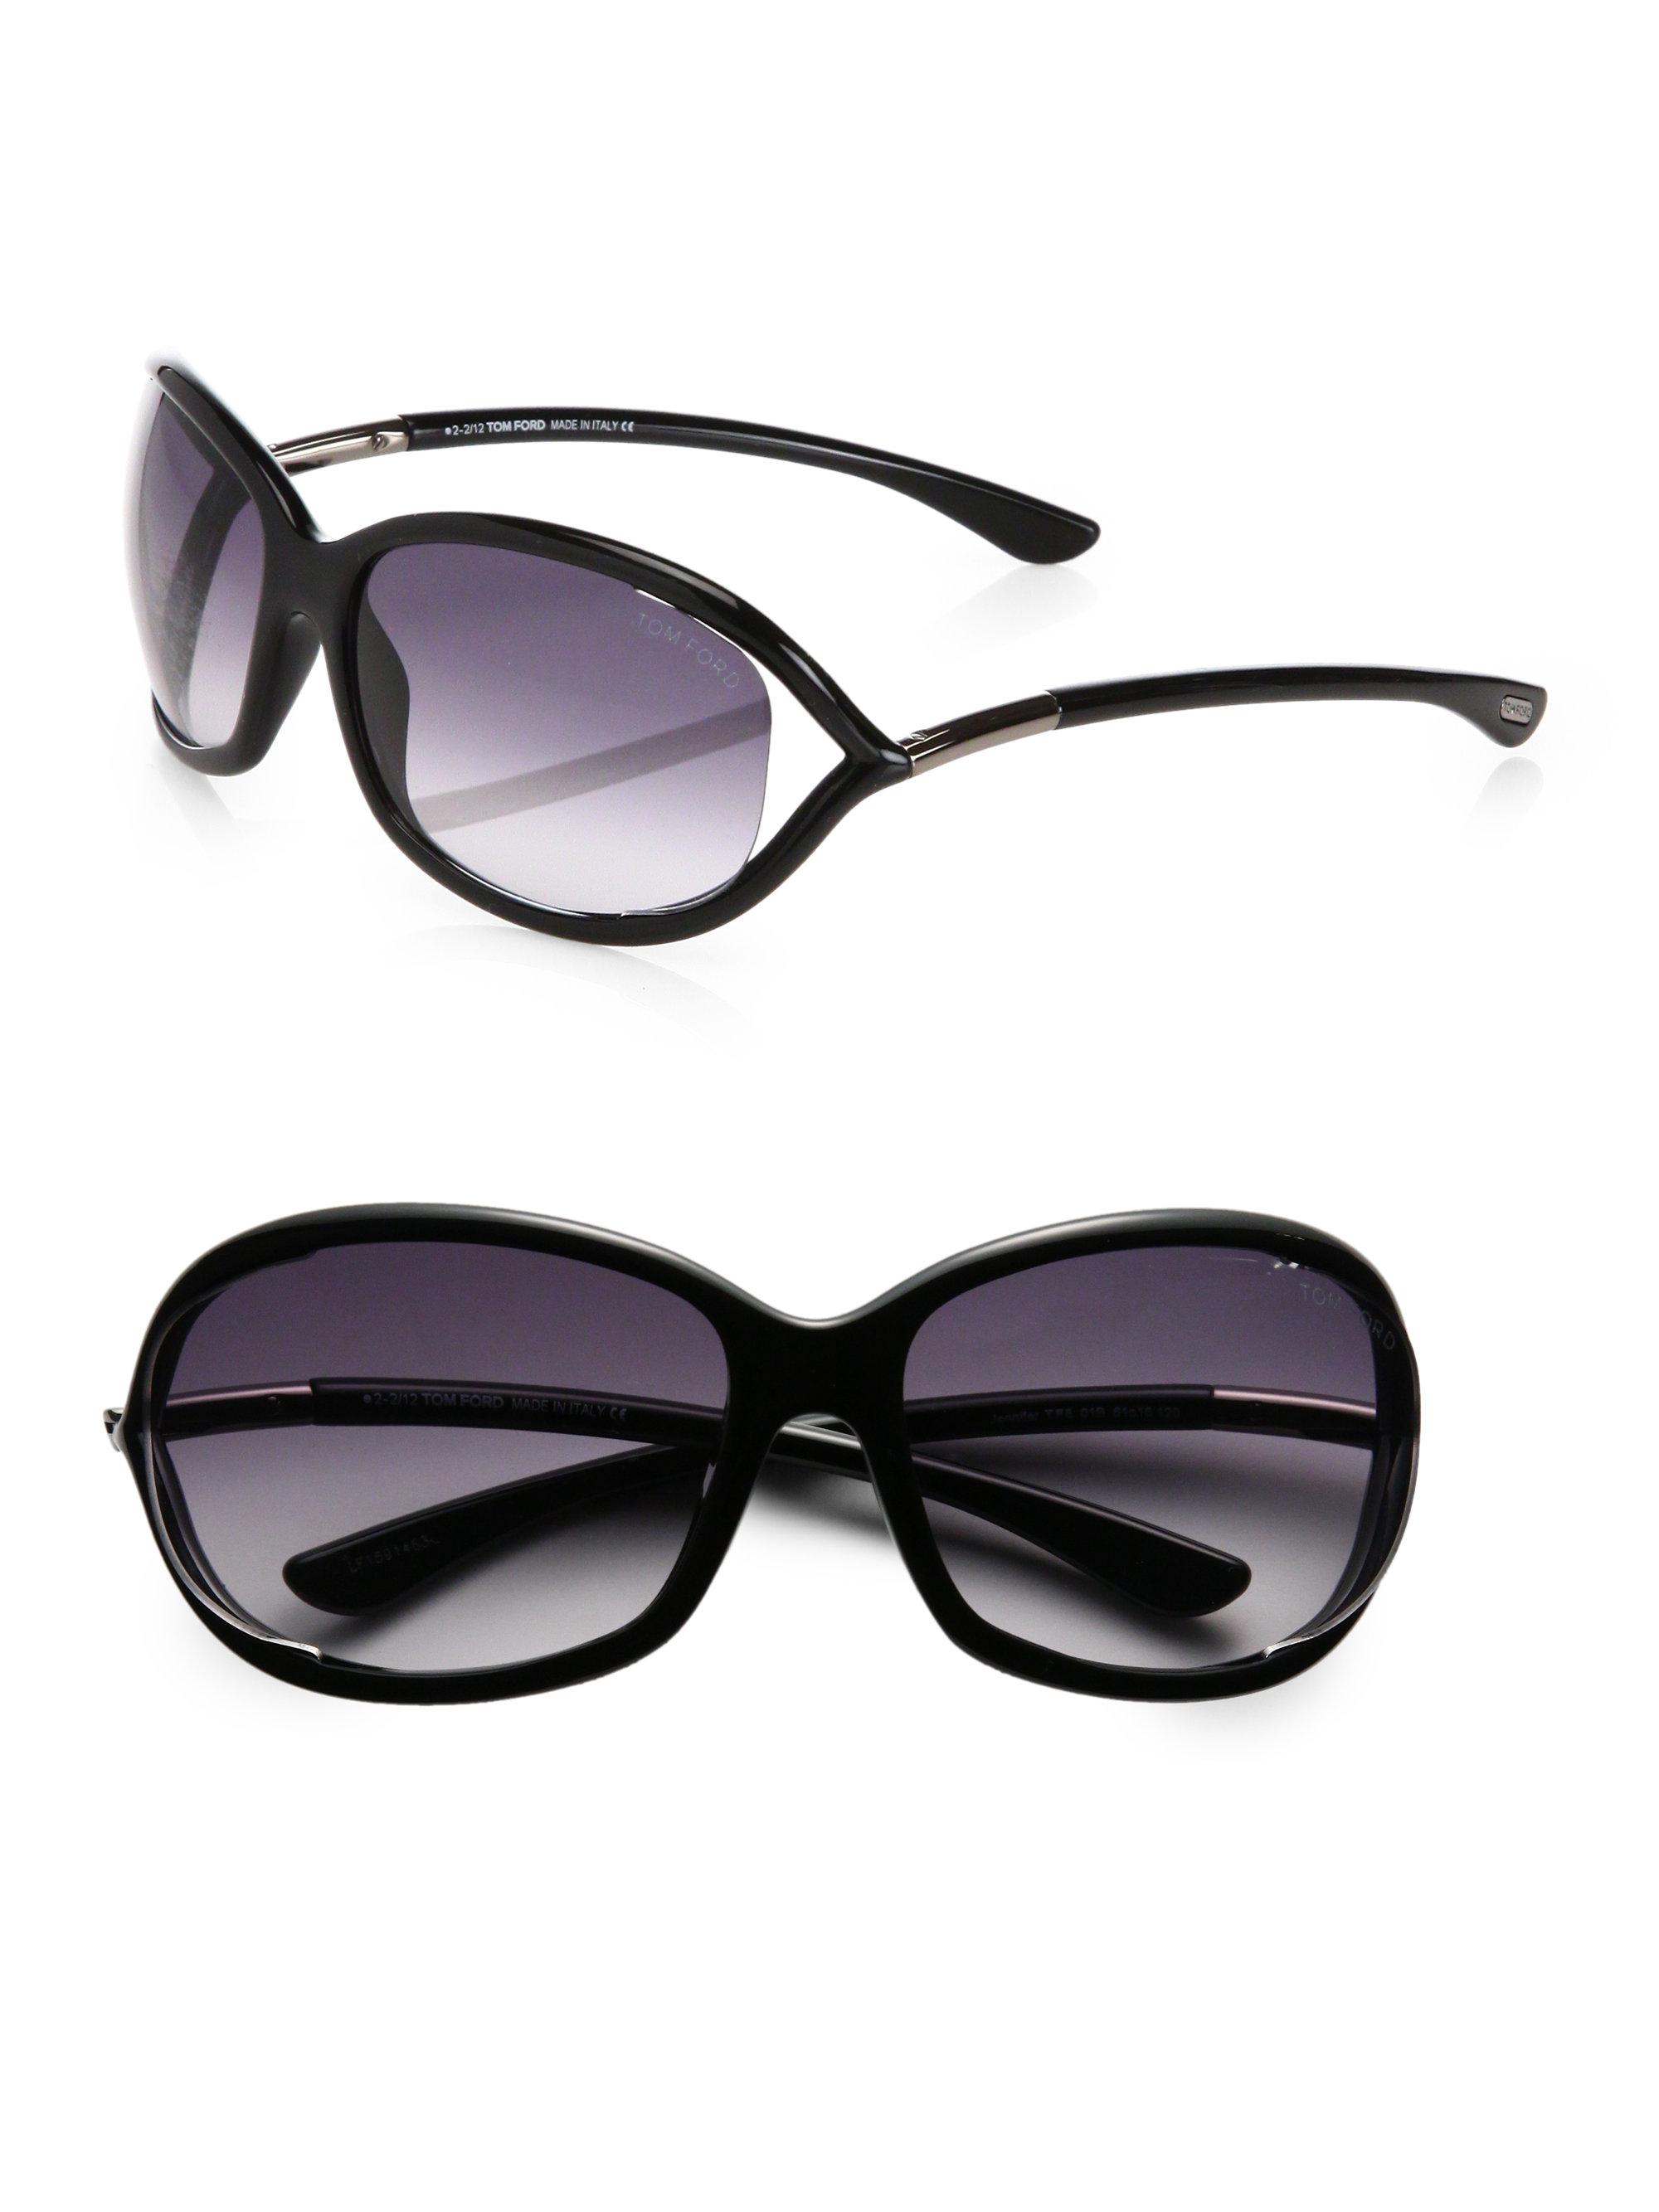 tom ford black sunglasses aviators les baux de provence. Black Bedroom Furniture Sets. Home Design Ideas